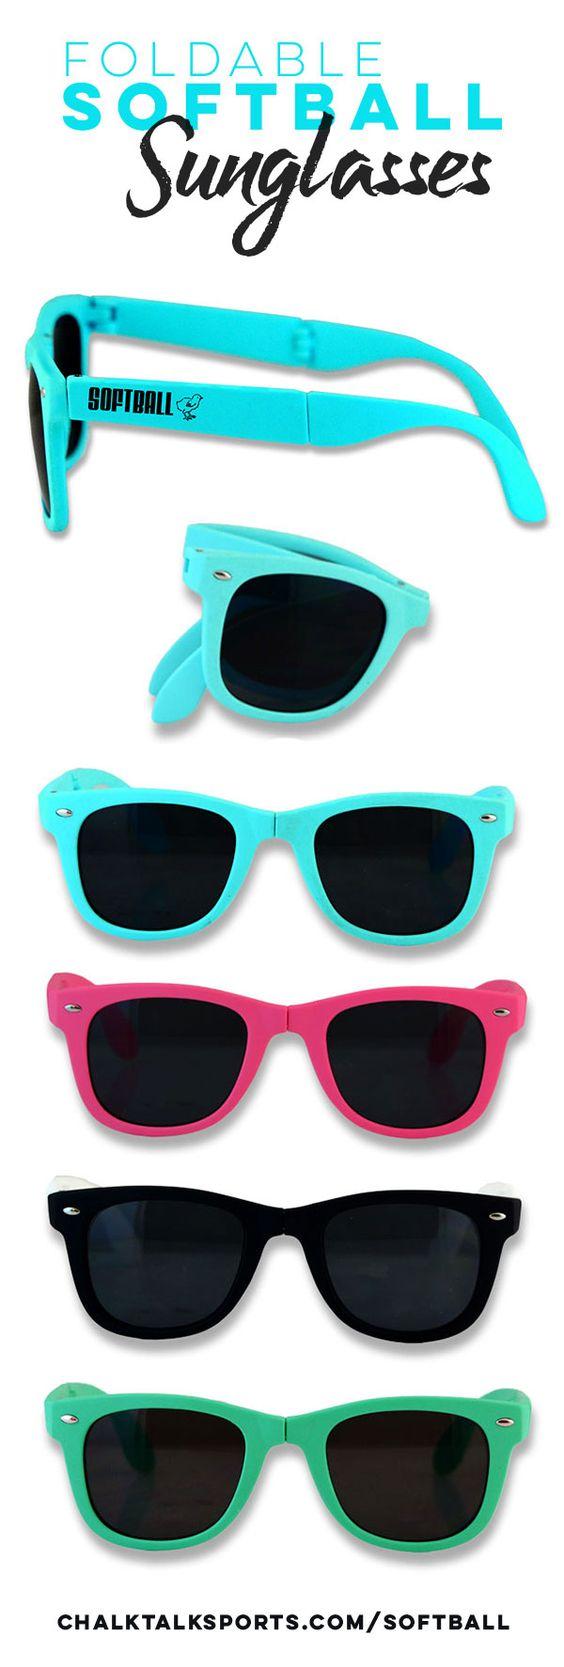 77b08b48a5 Fastpitch Softball Sunglasses